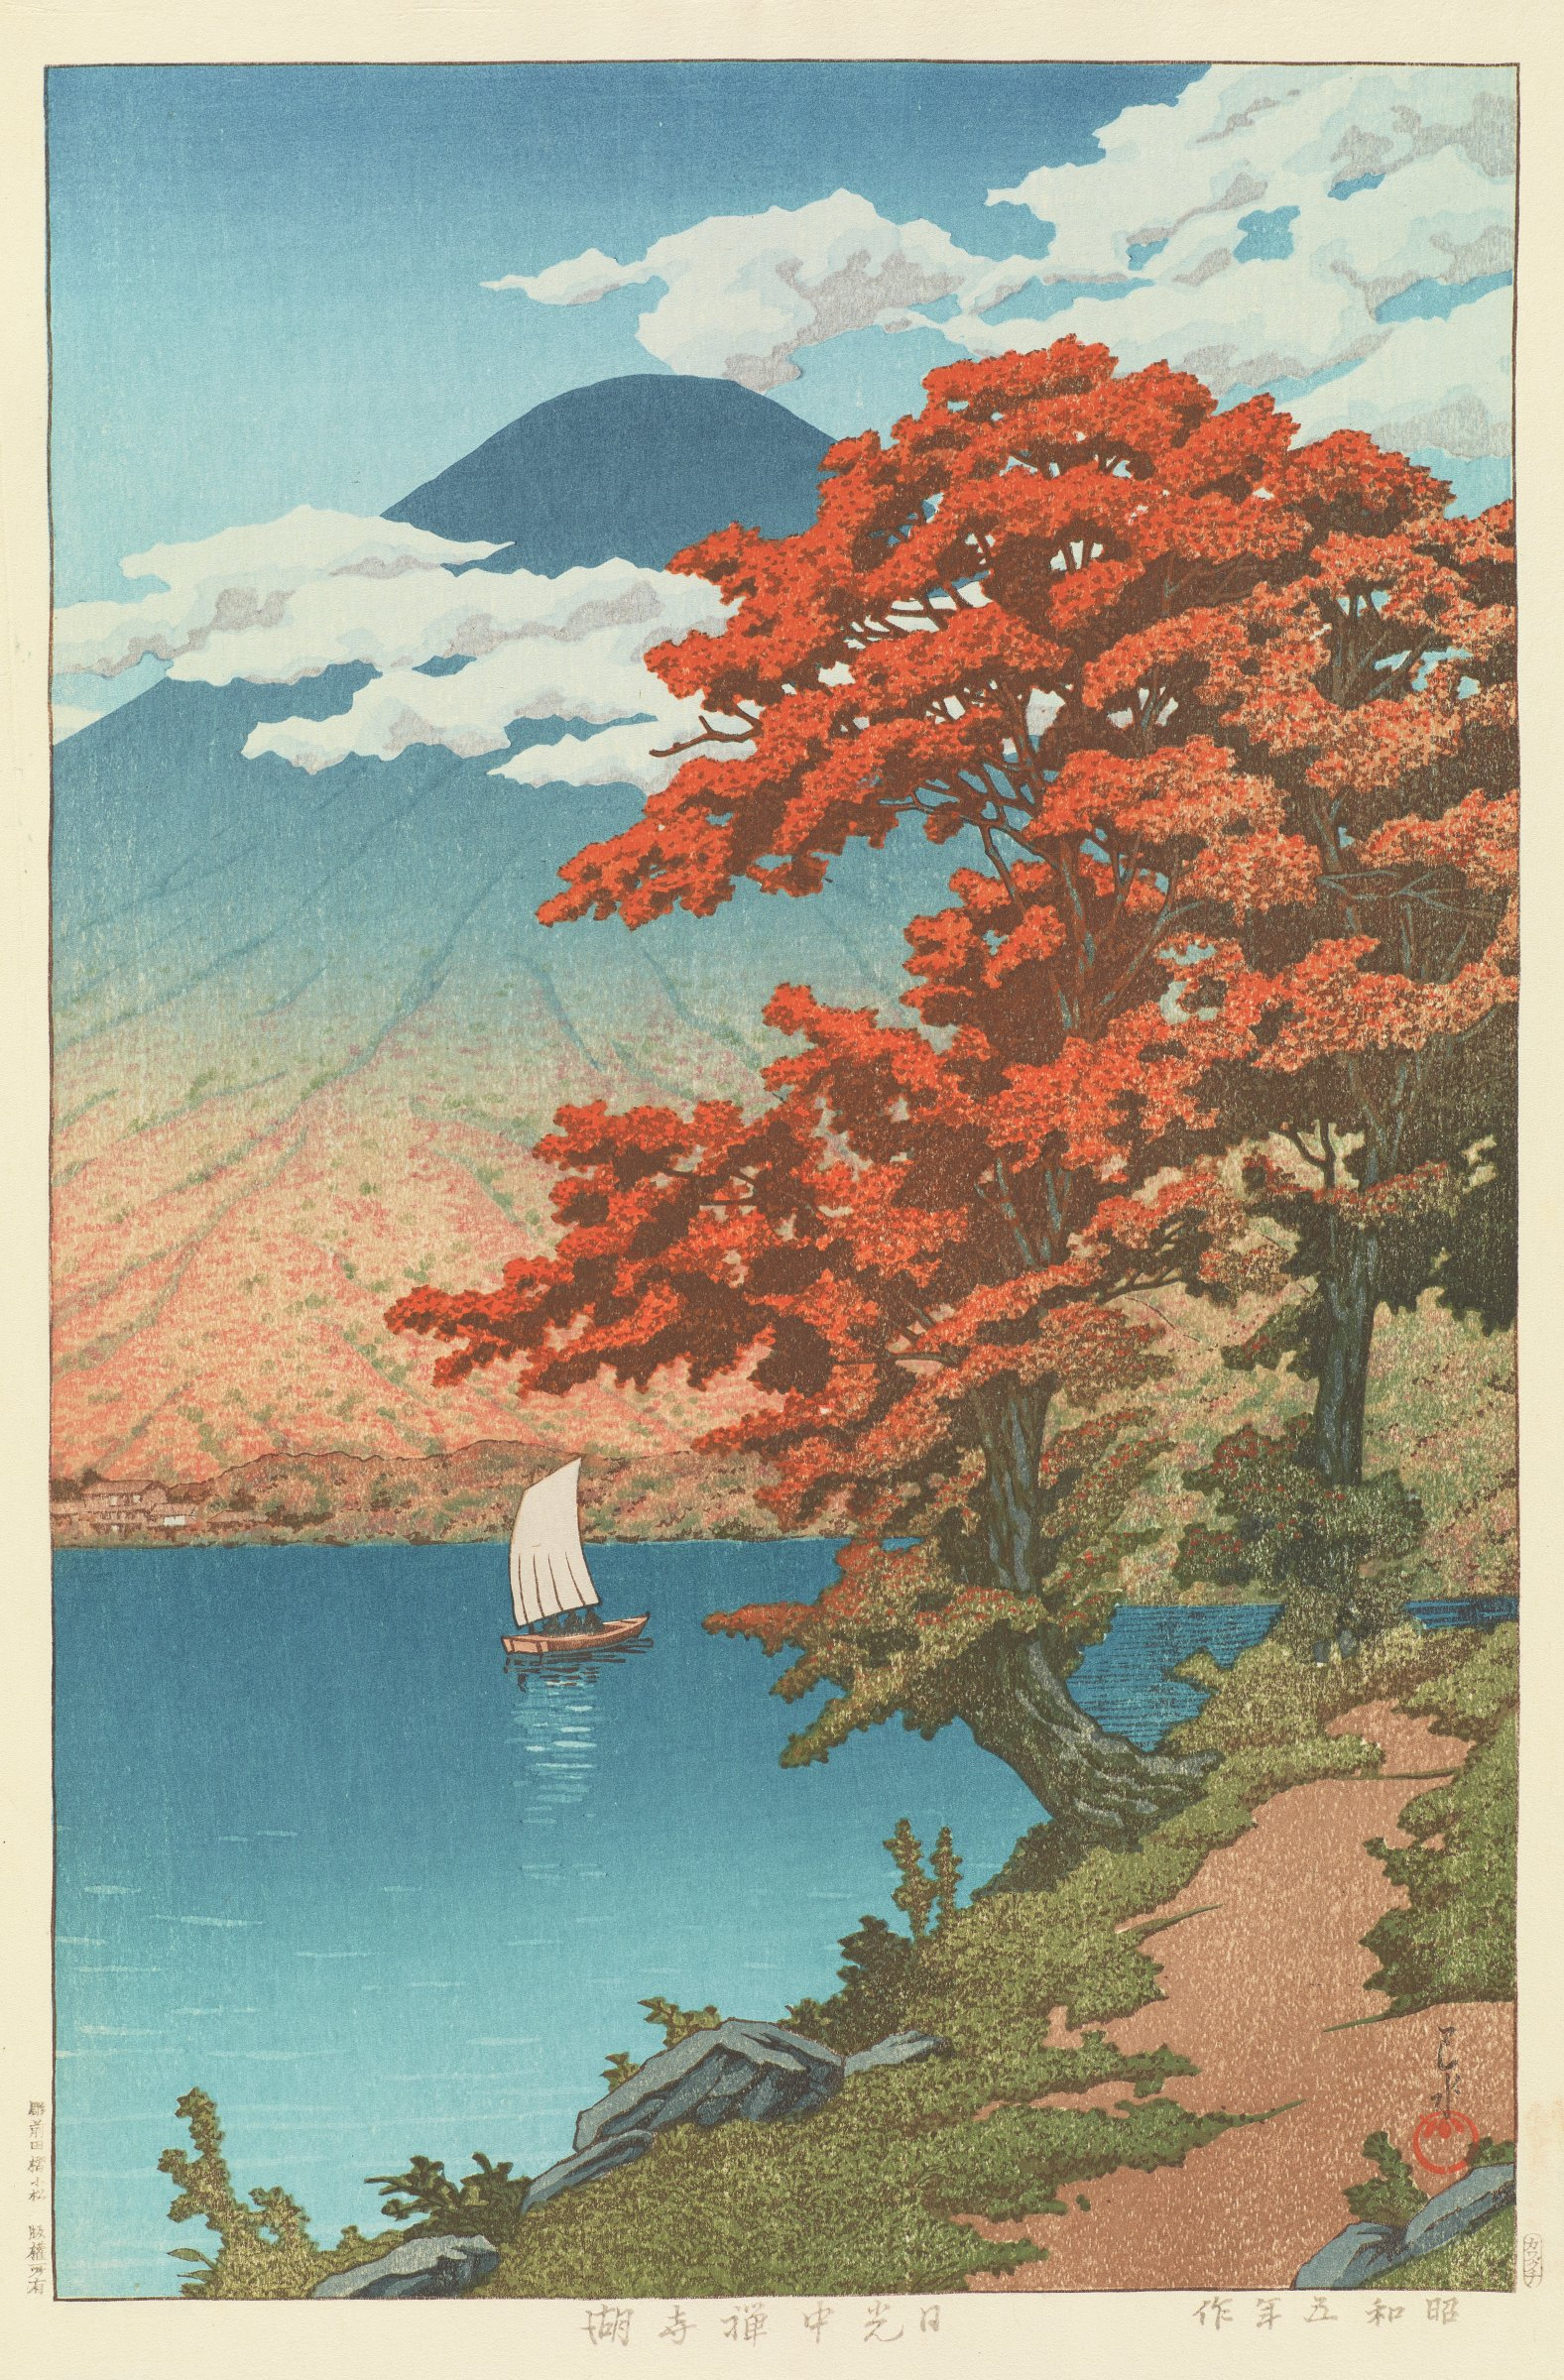 Lake Chūzenji, Nikkō, Kawase Hasui, ink and color on paper